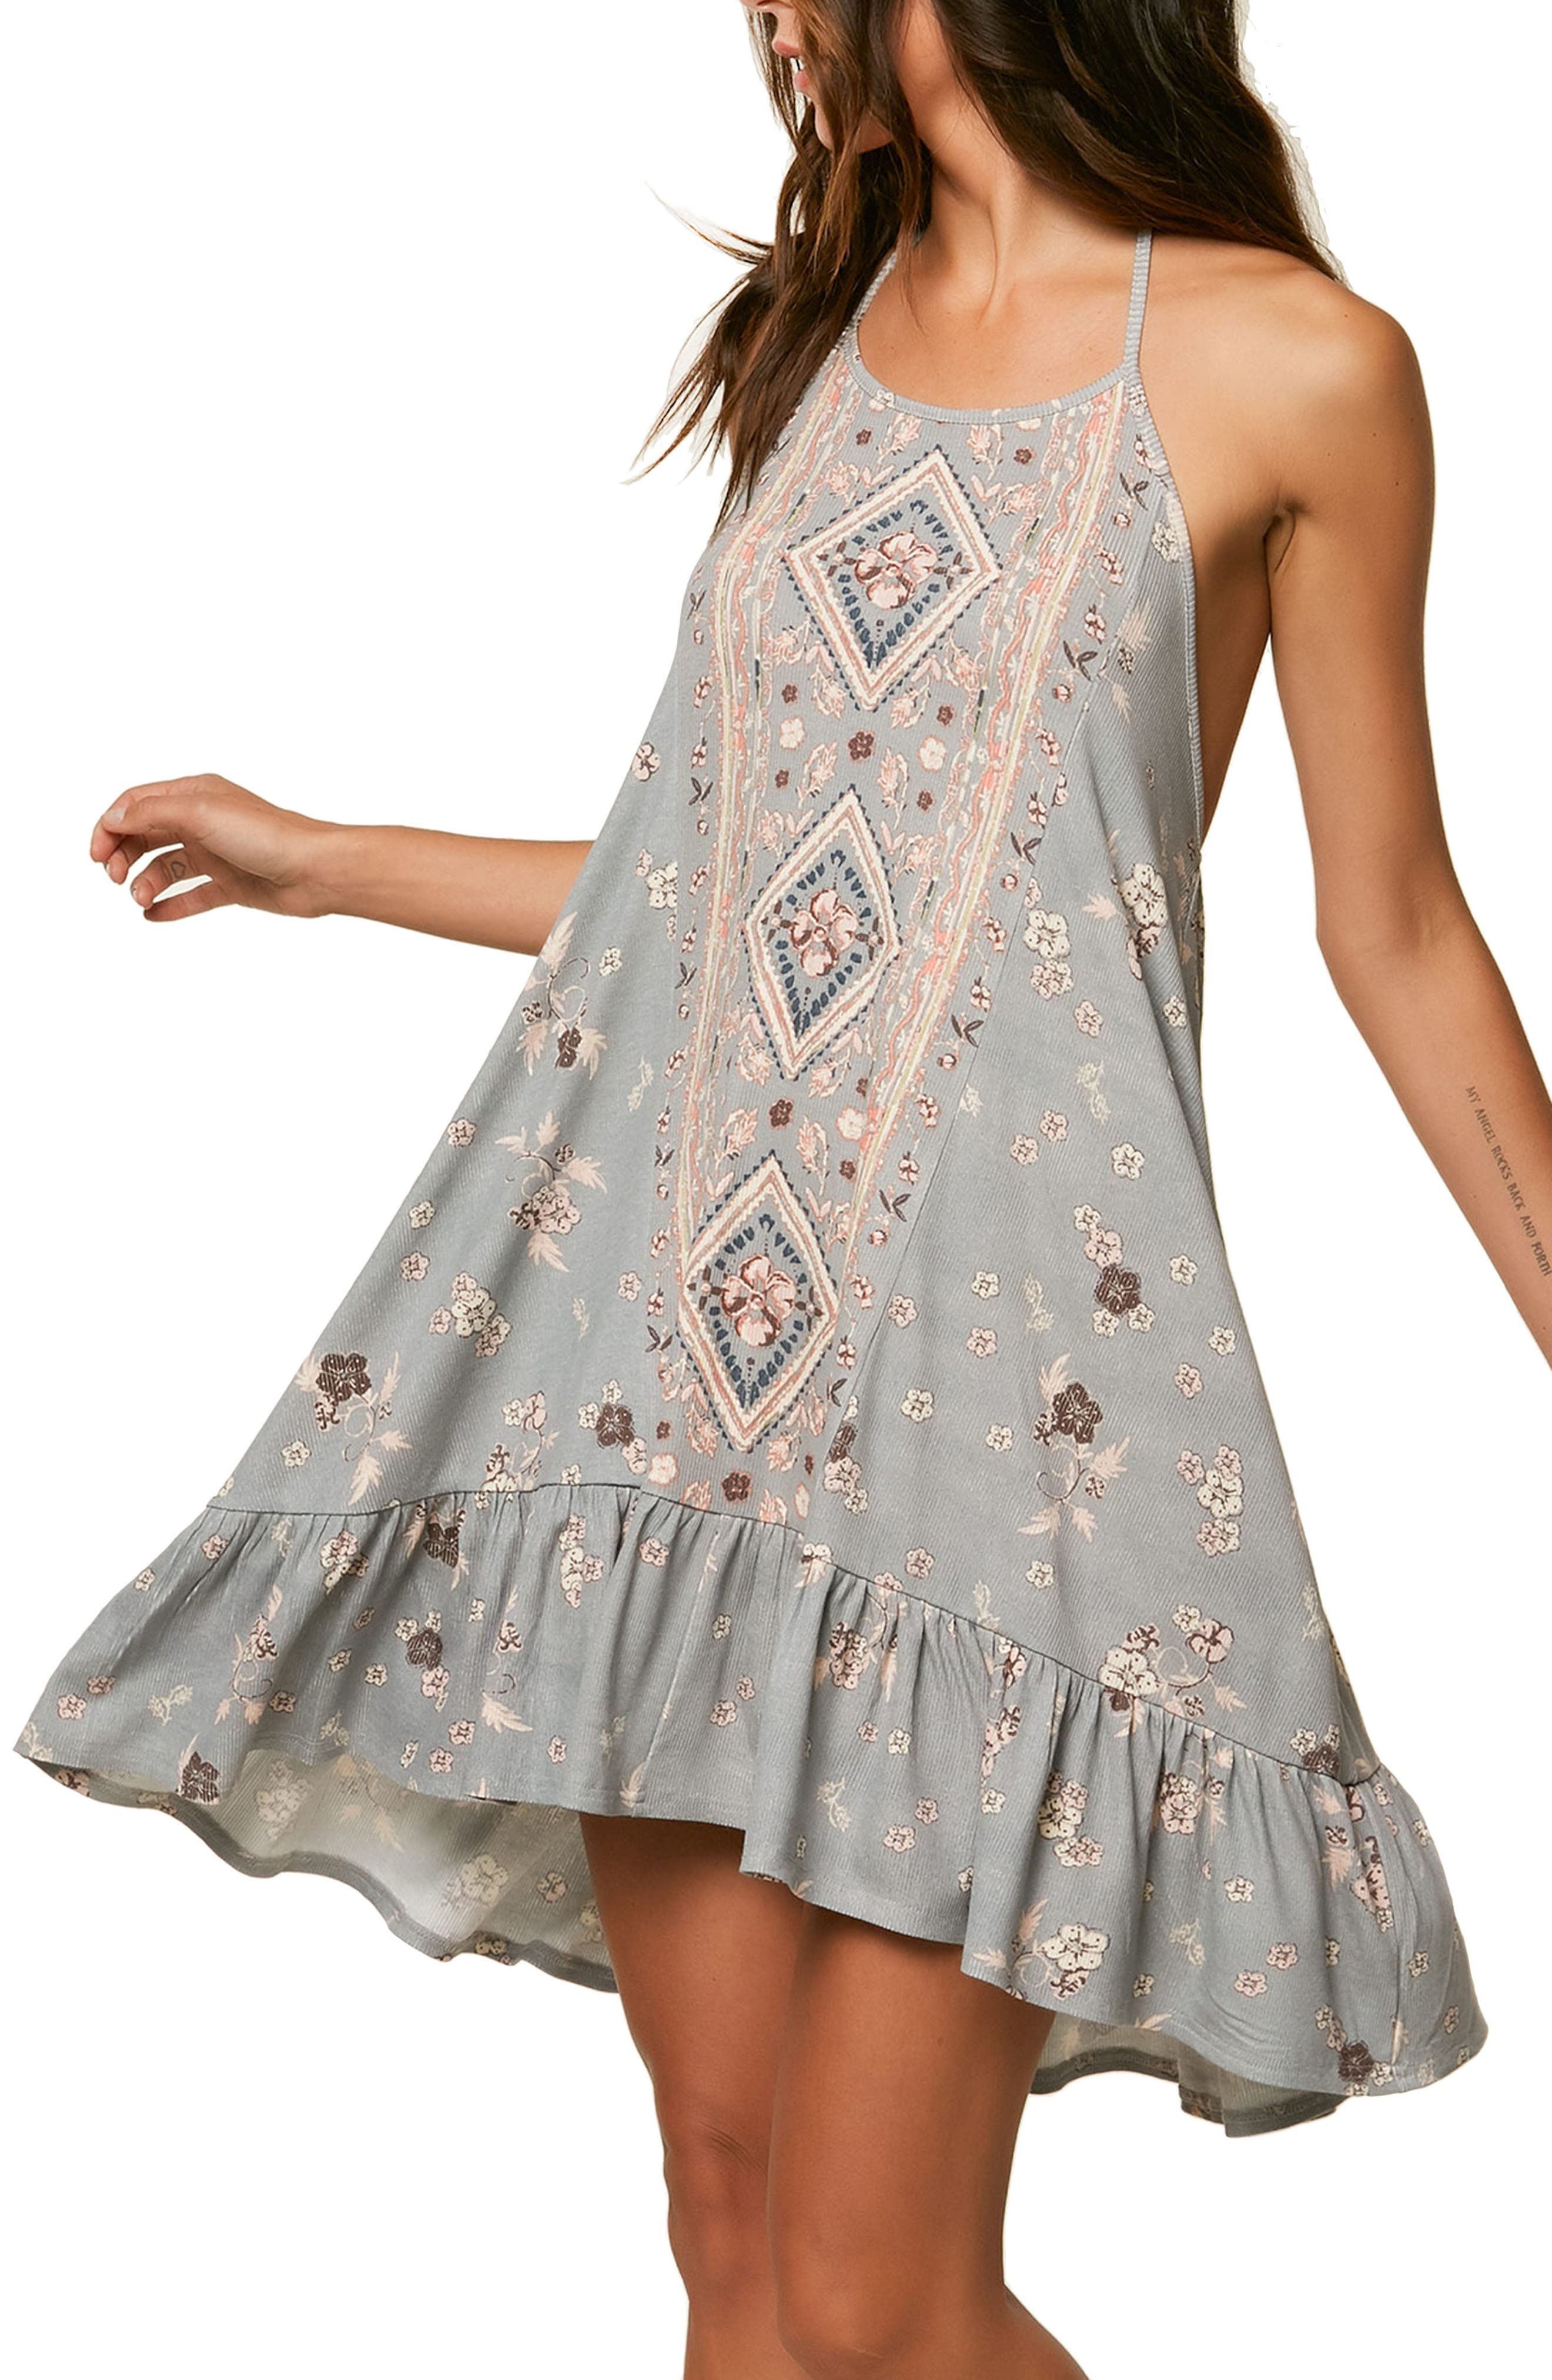 Sonoma Print Halter Dress,                             Main thumbnail 1, color,                             Neutral Gray